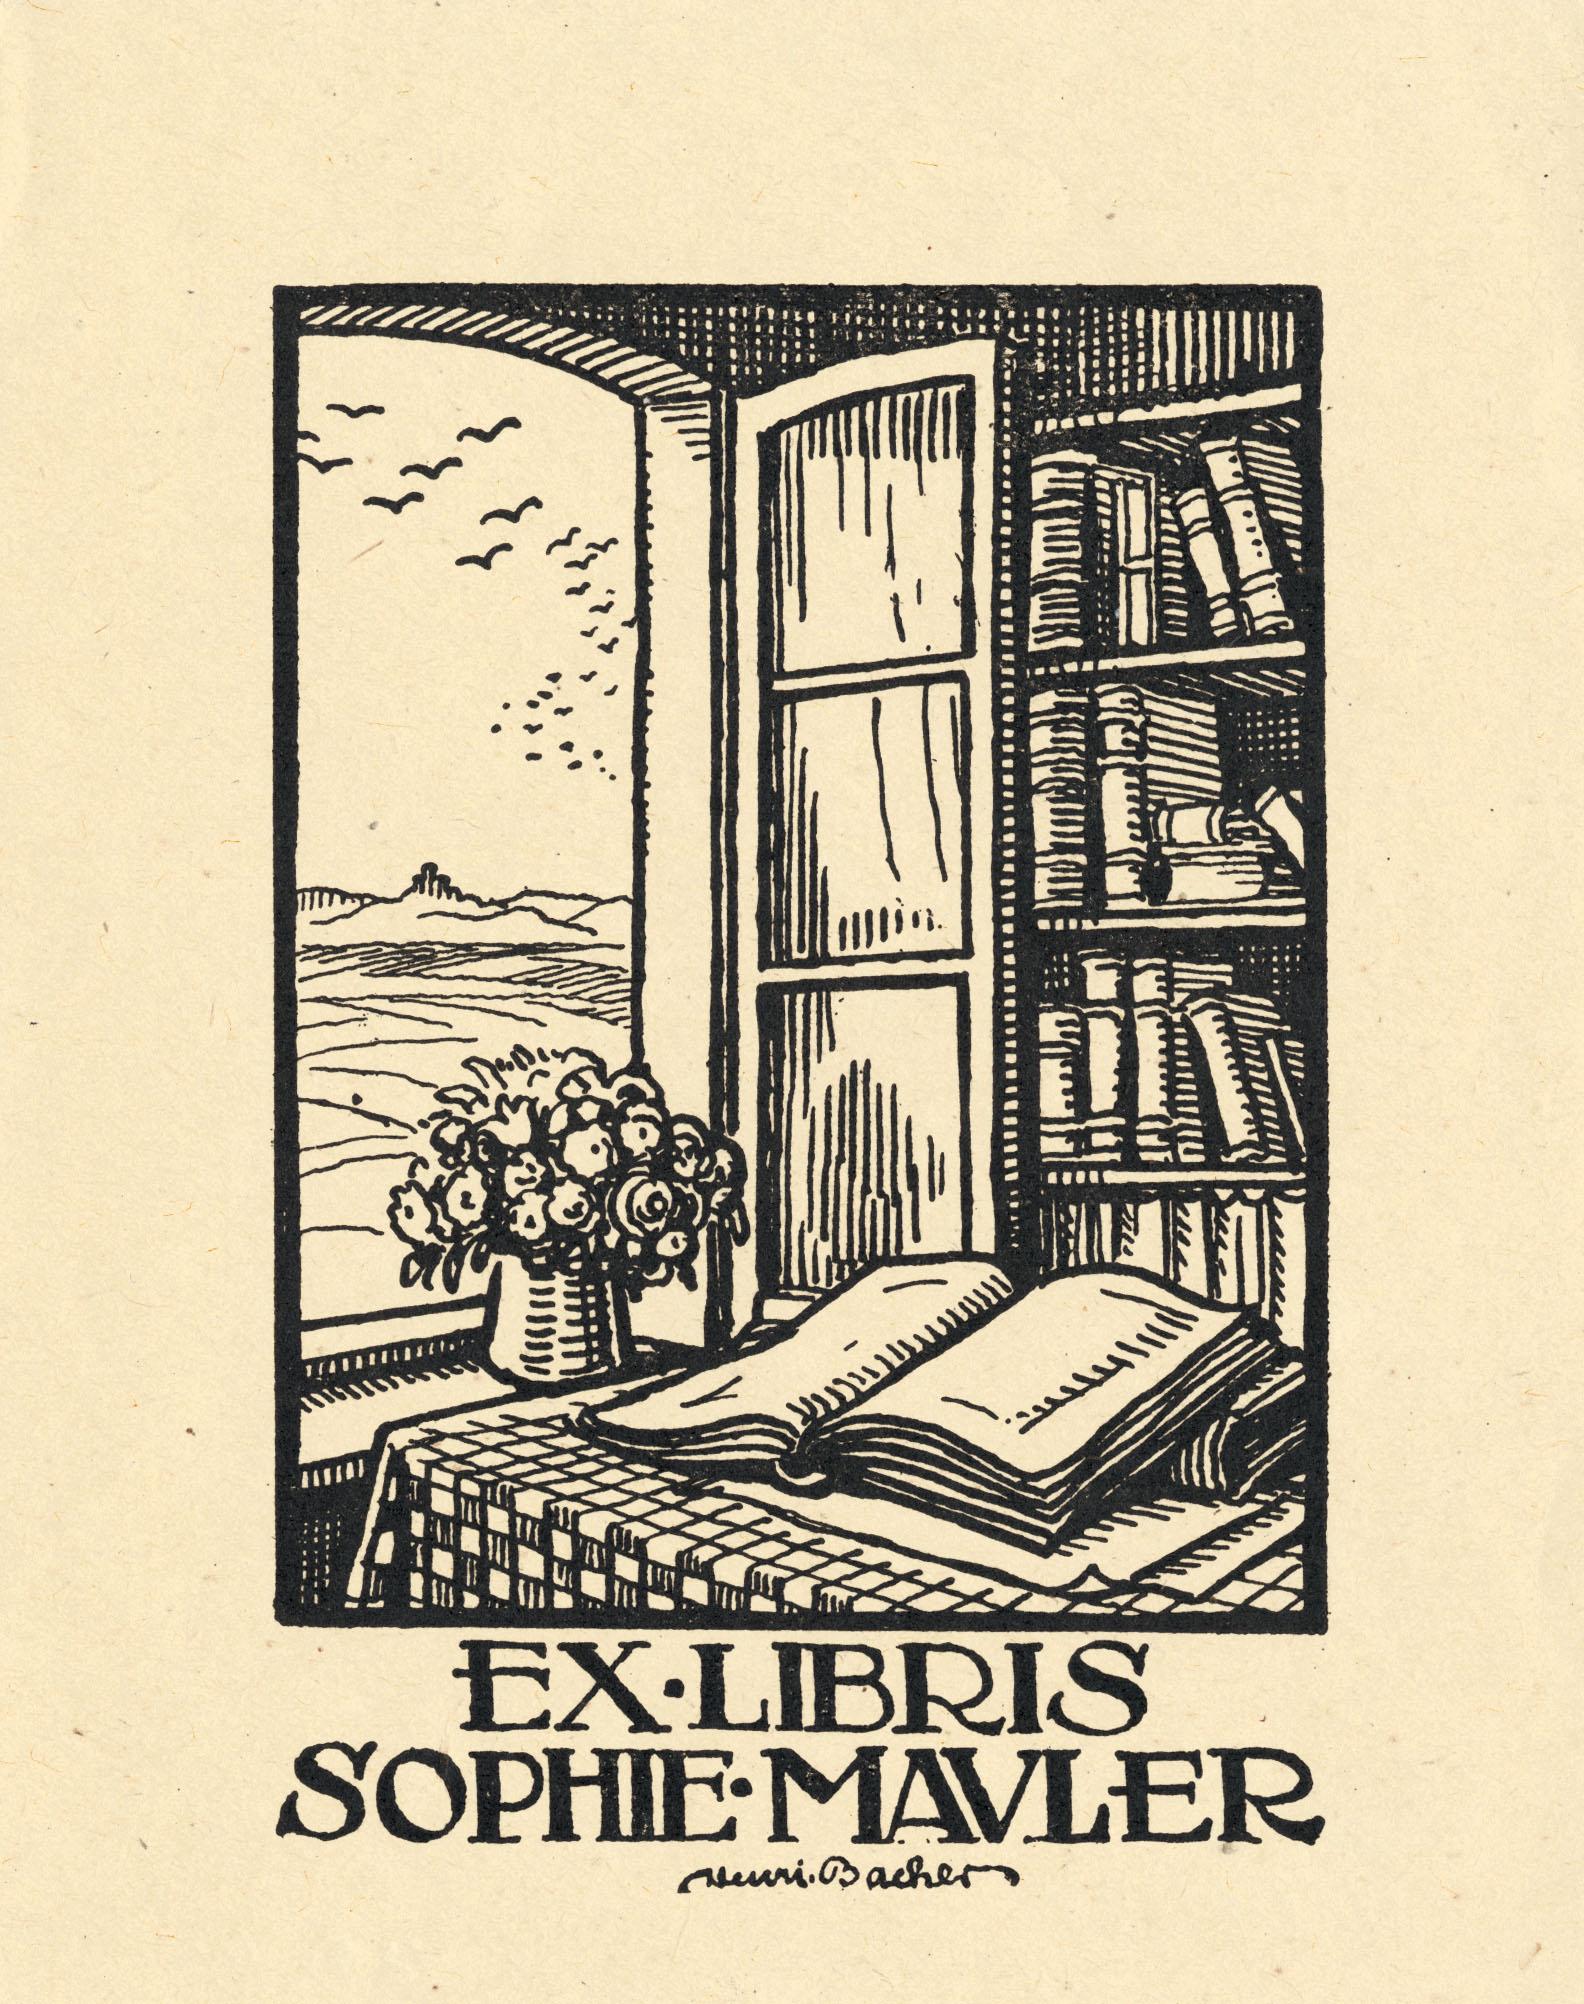 Description Ex libris Sophie Mauler.jpg: commons.wikimedia.org/wiki/File:Ex_libris_Sophie_Mauler.jpg